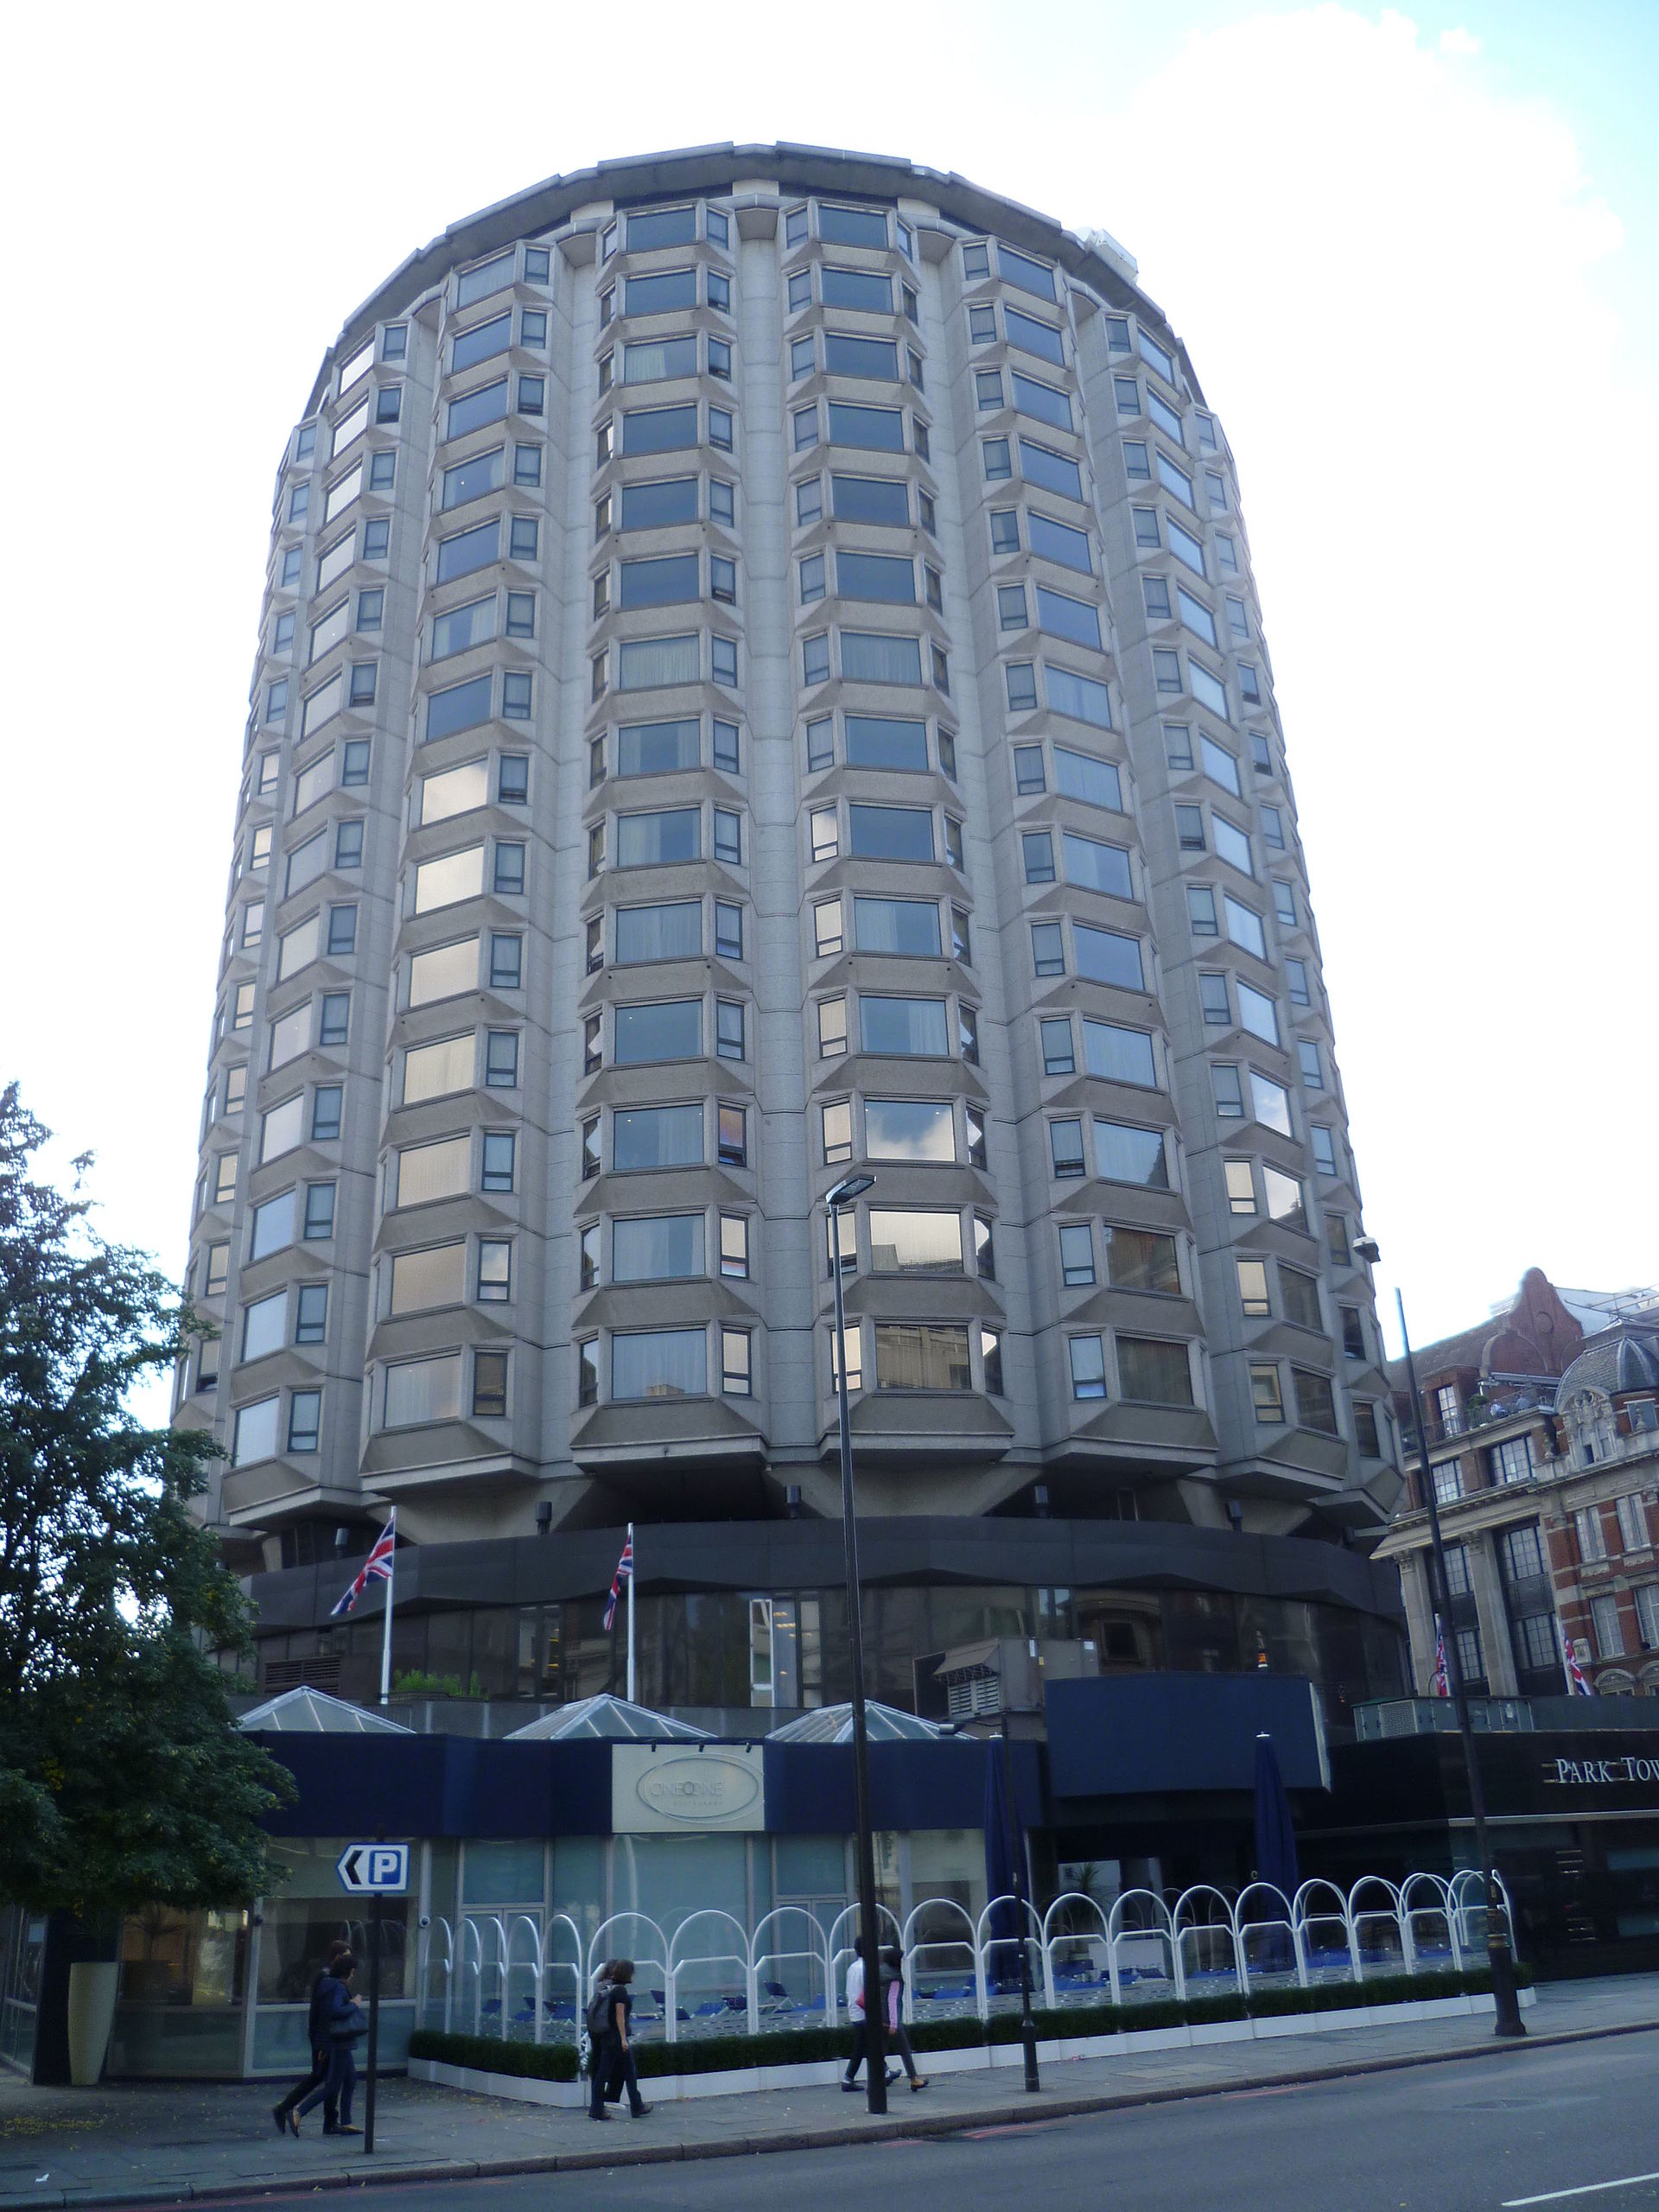 The Park Tower Knightsbridge Hotel Wikipedia